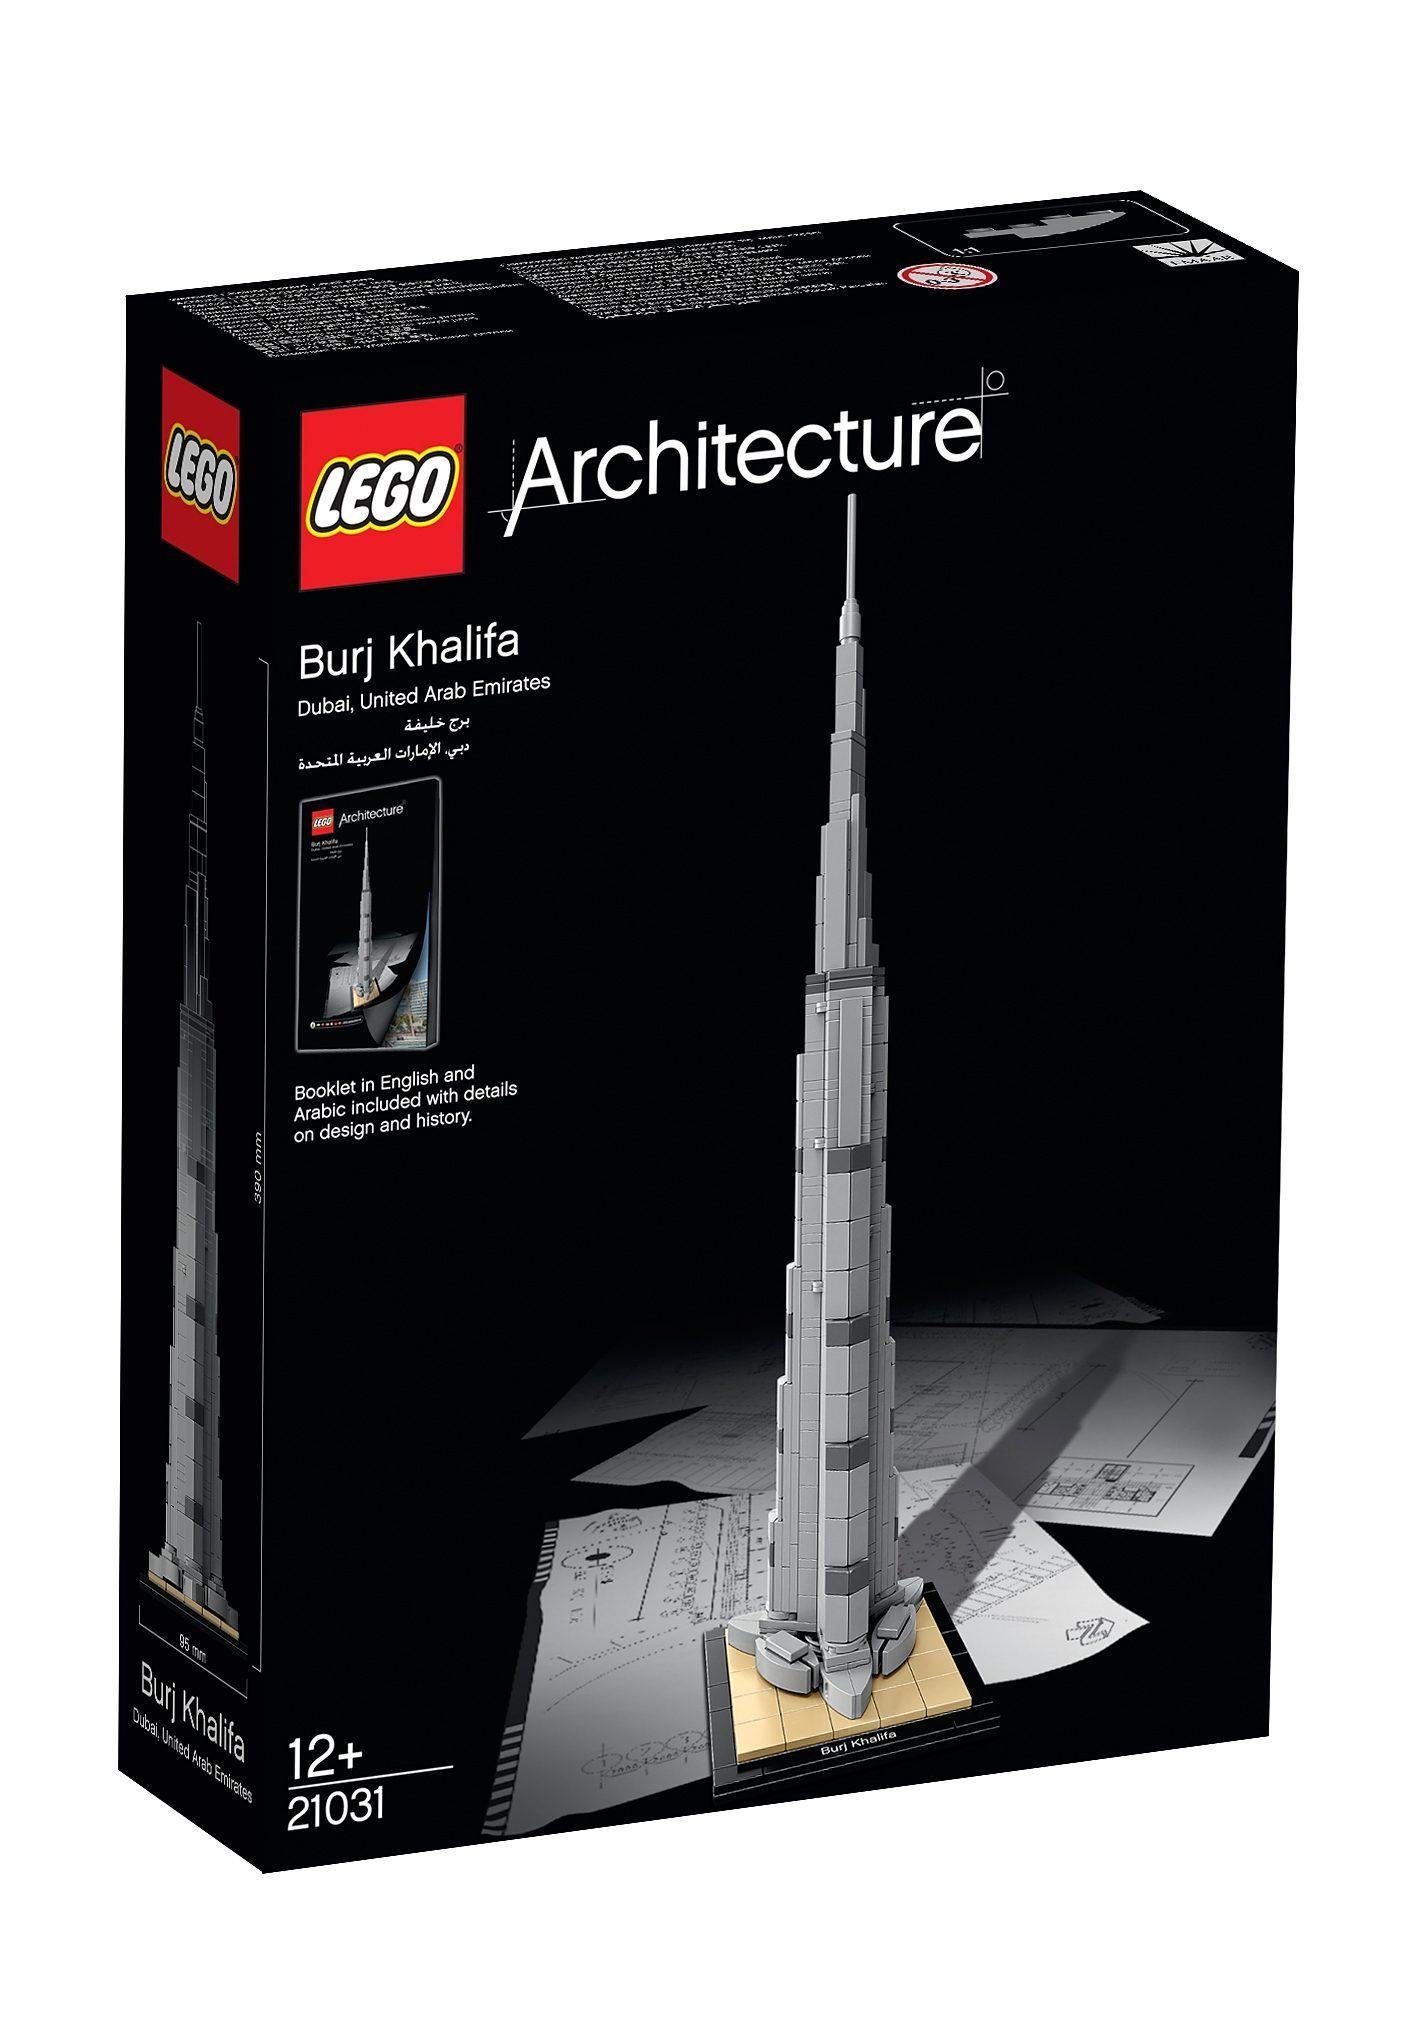 LEGO®, Burj Khalifa (21031), »LEGO® Architecture«